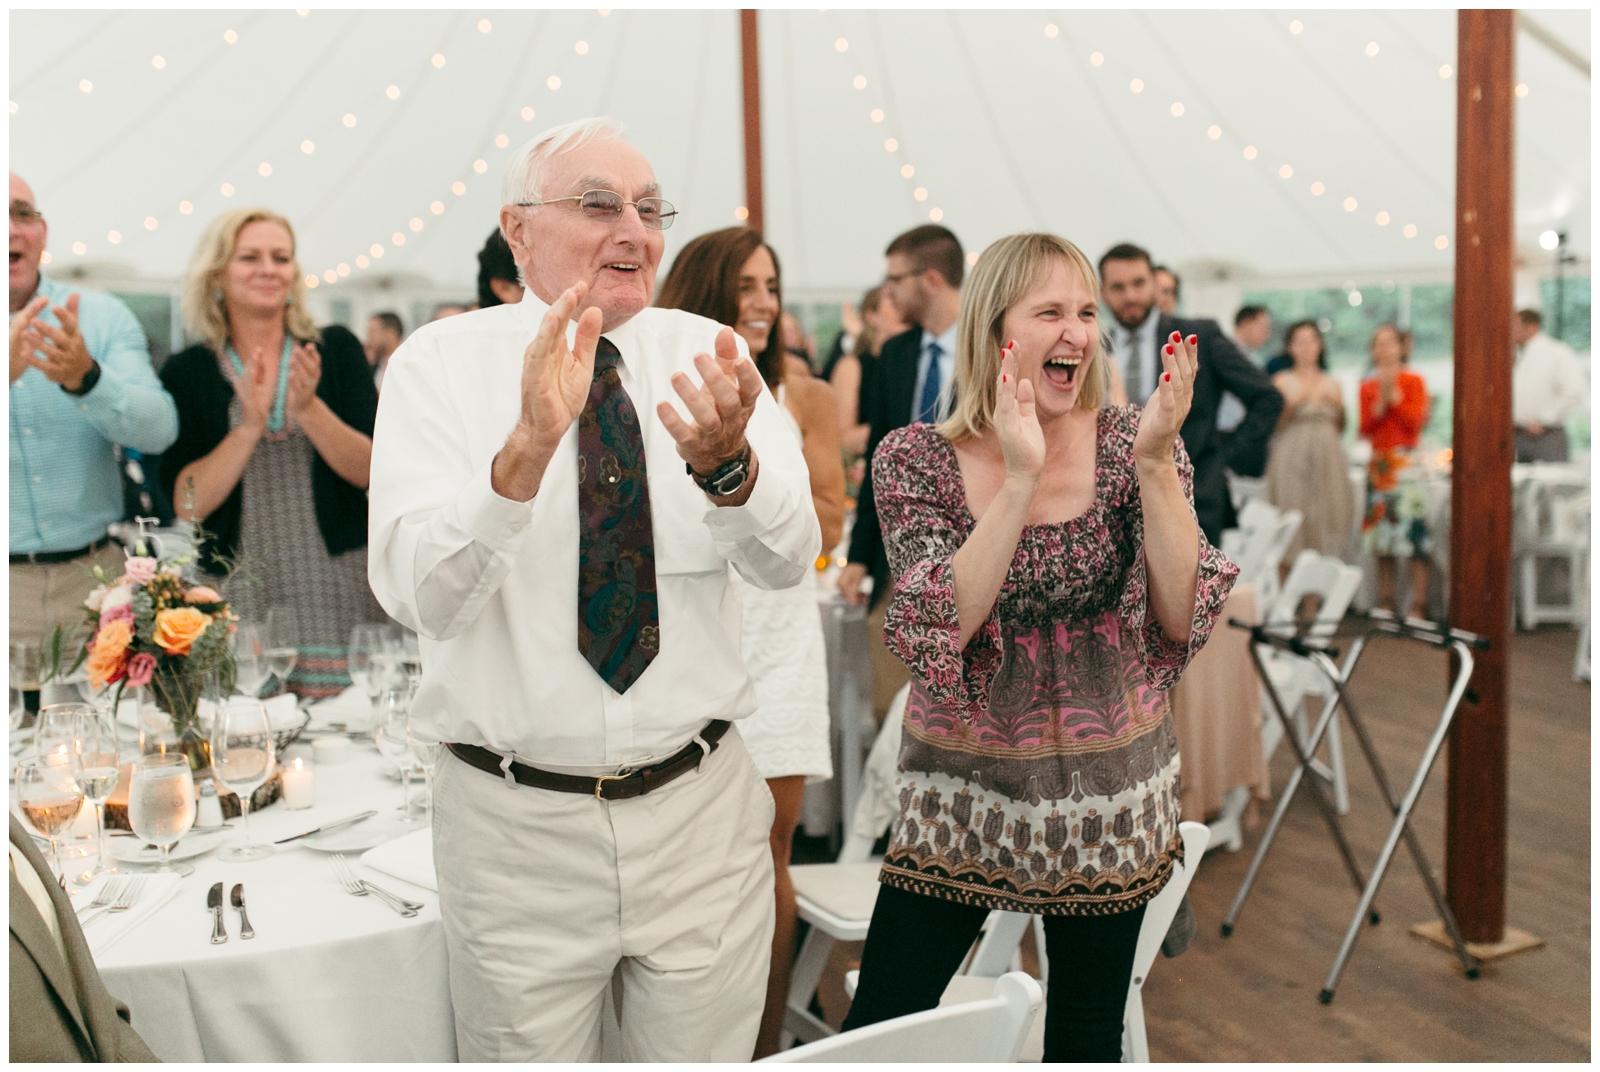 Moraine-Farm-wedding-Bailey-Q-Photo-Massachusetts-wedding-photpgrapher-112.jpg